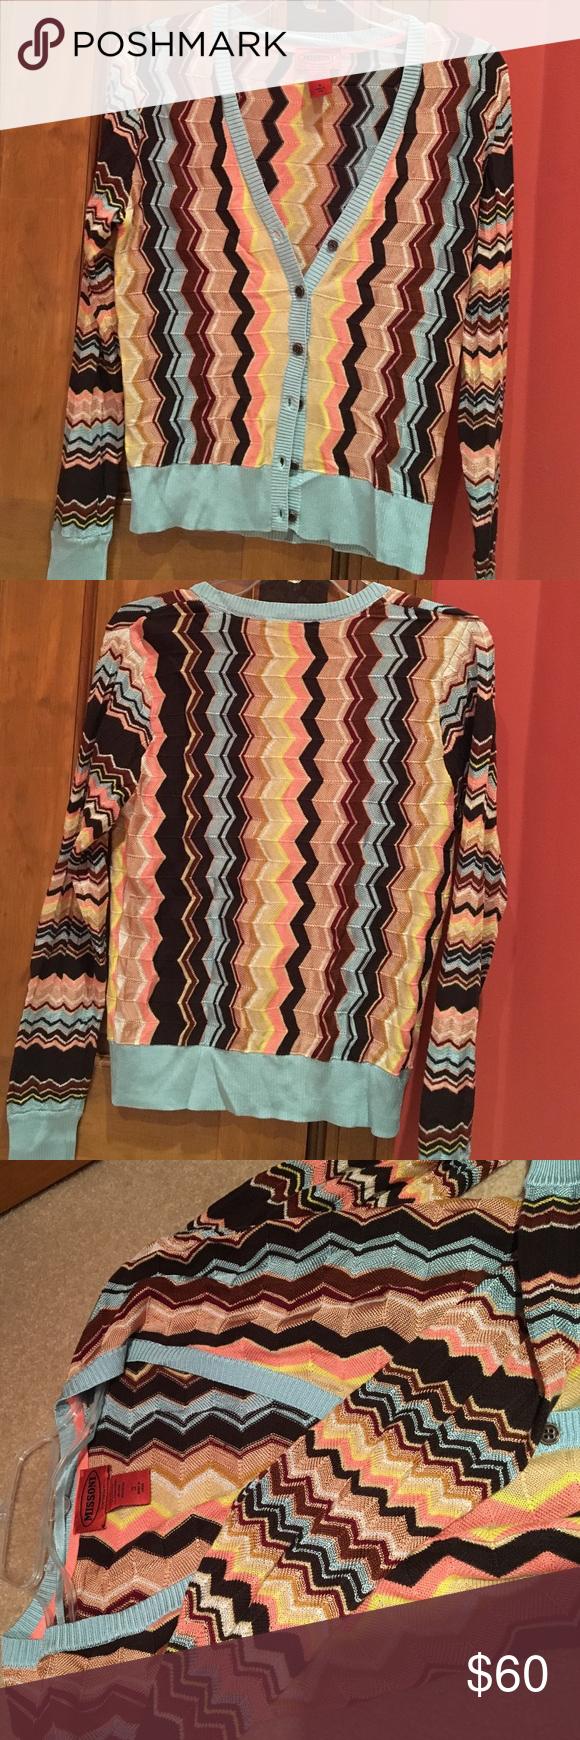 NWOT Missoni cardigan size small | Emma roberts, Missoni and Target